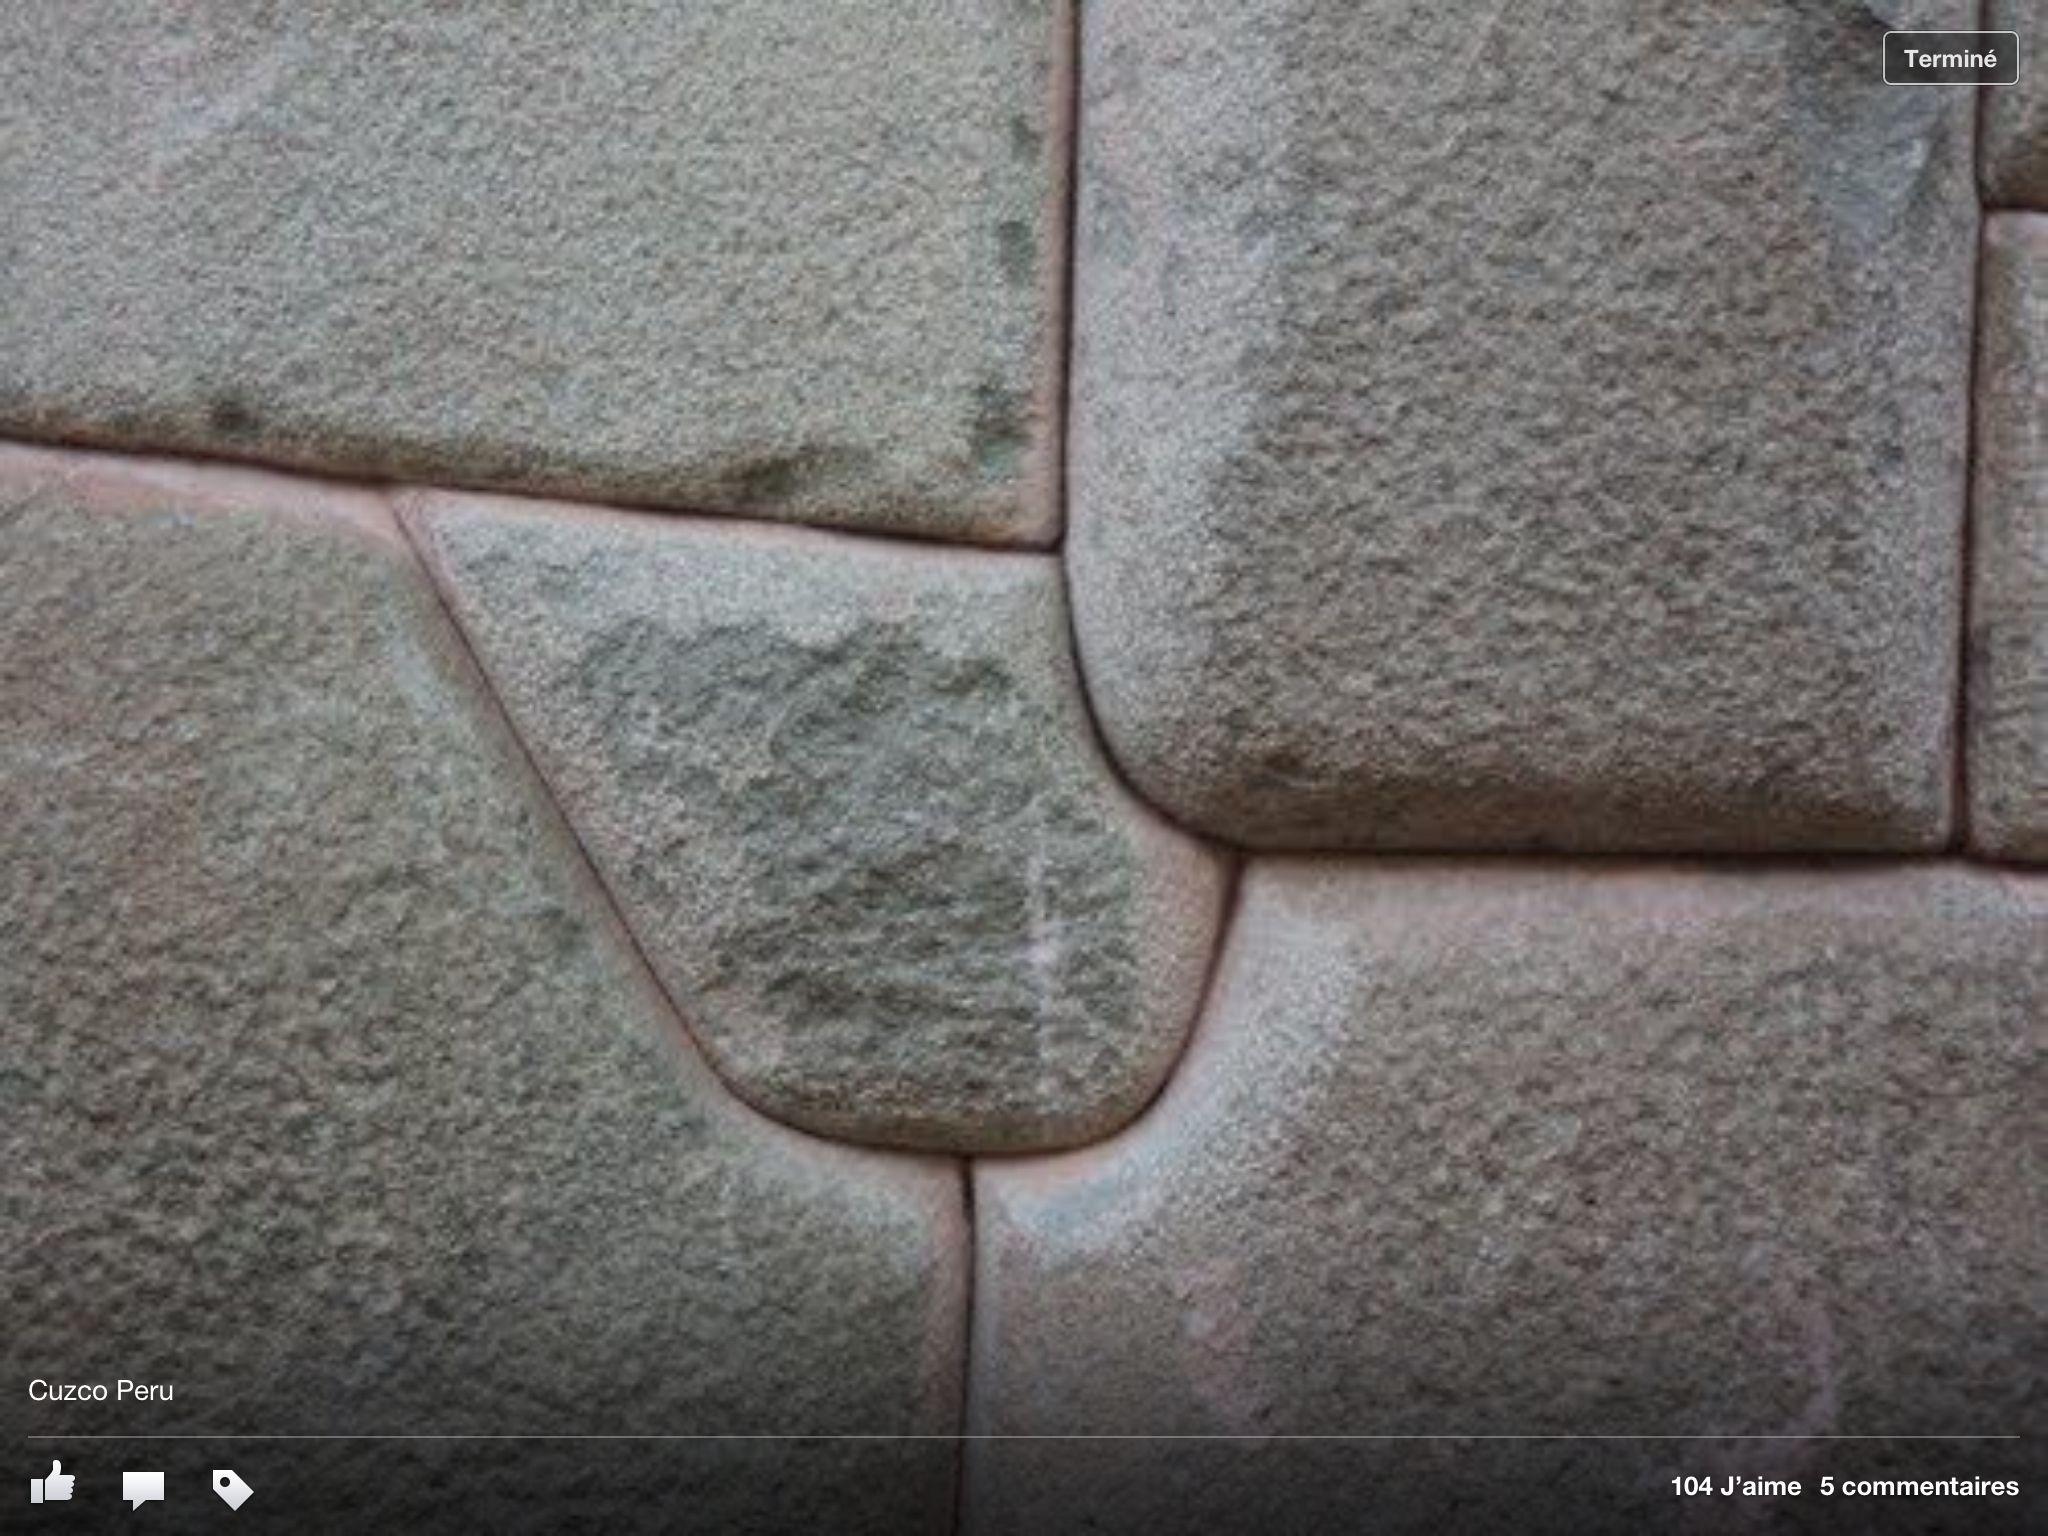 Cuzco Peru - like seriously?? WTF!!! >:(